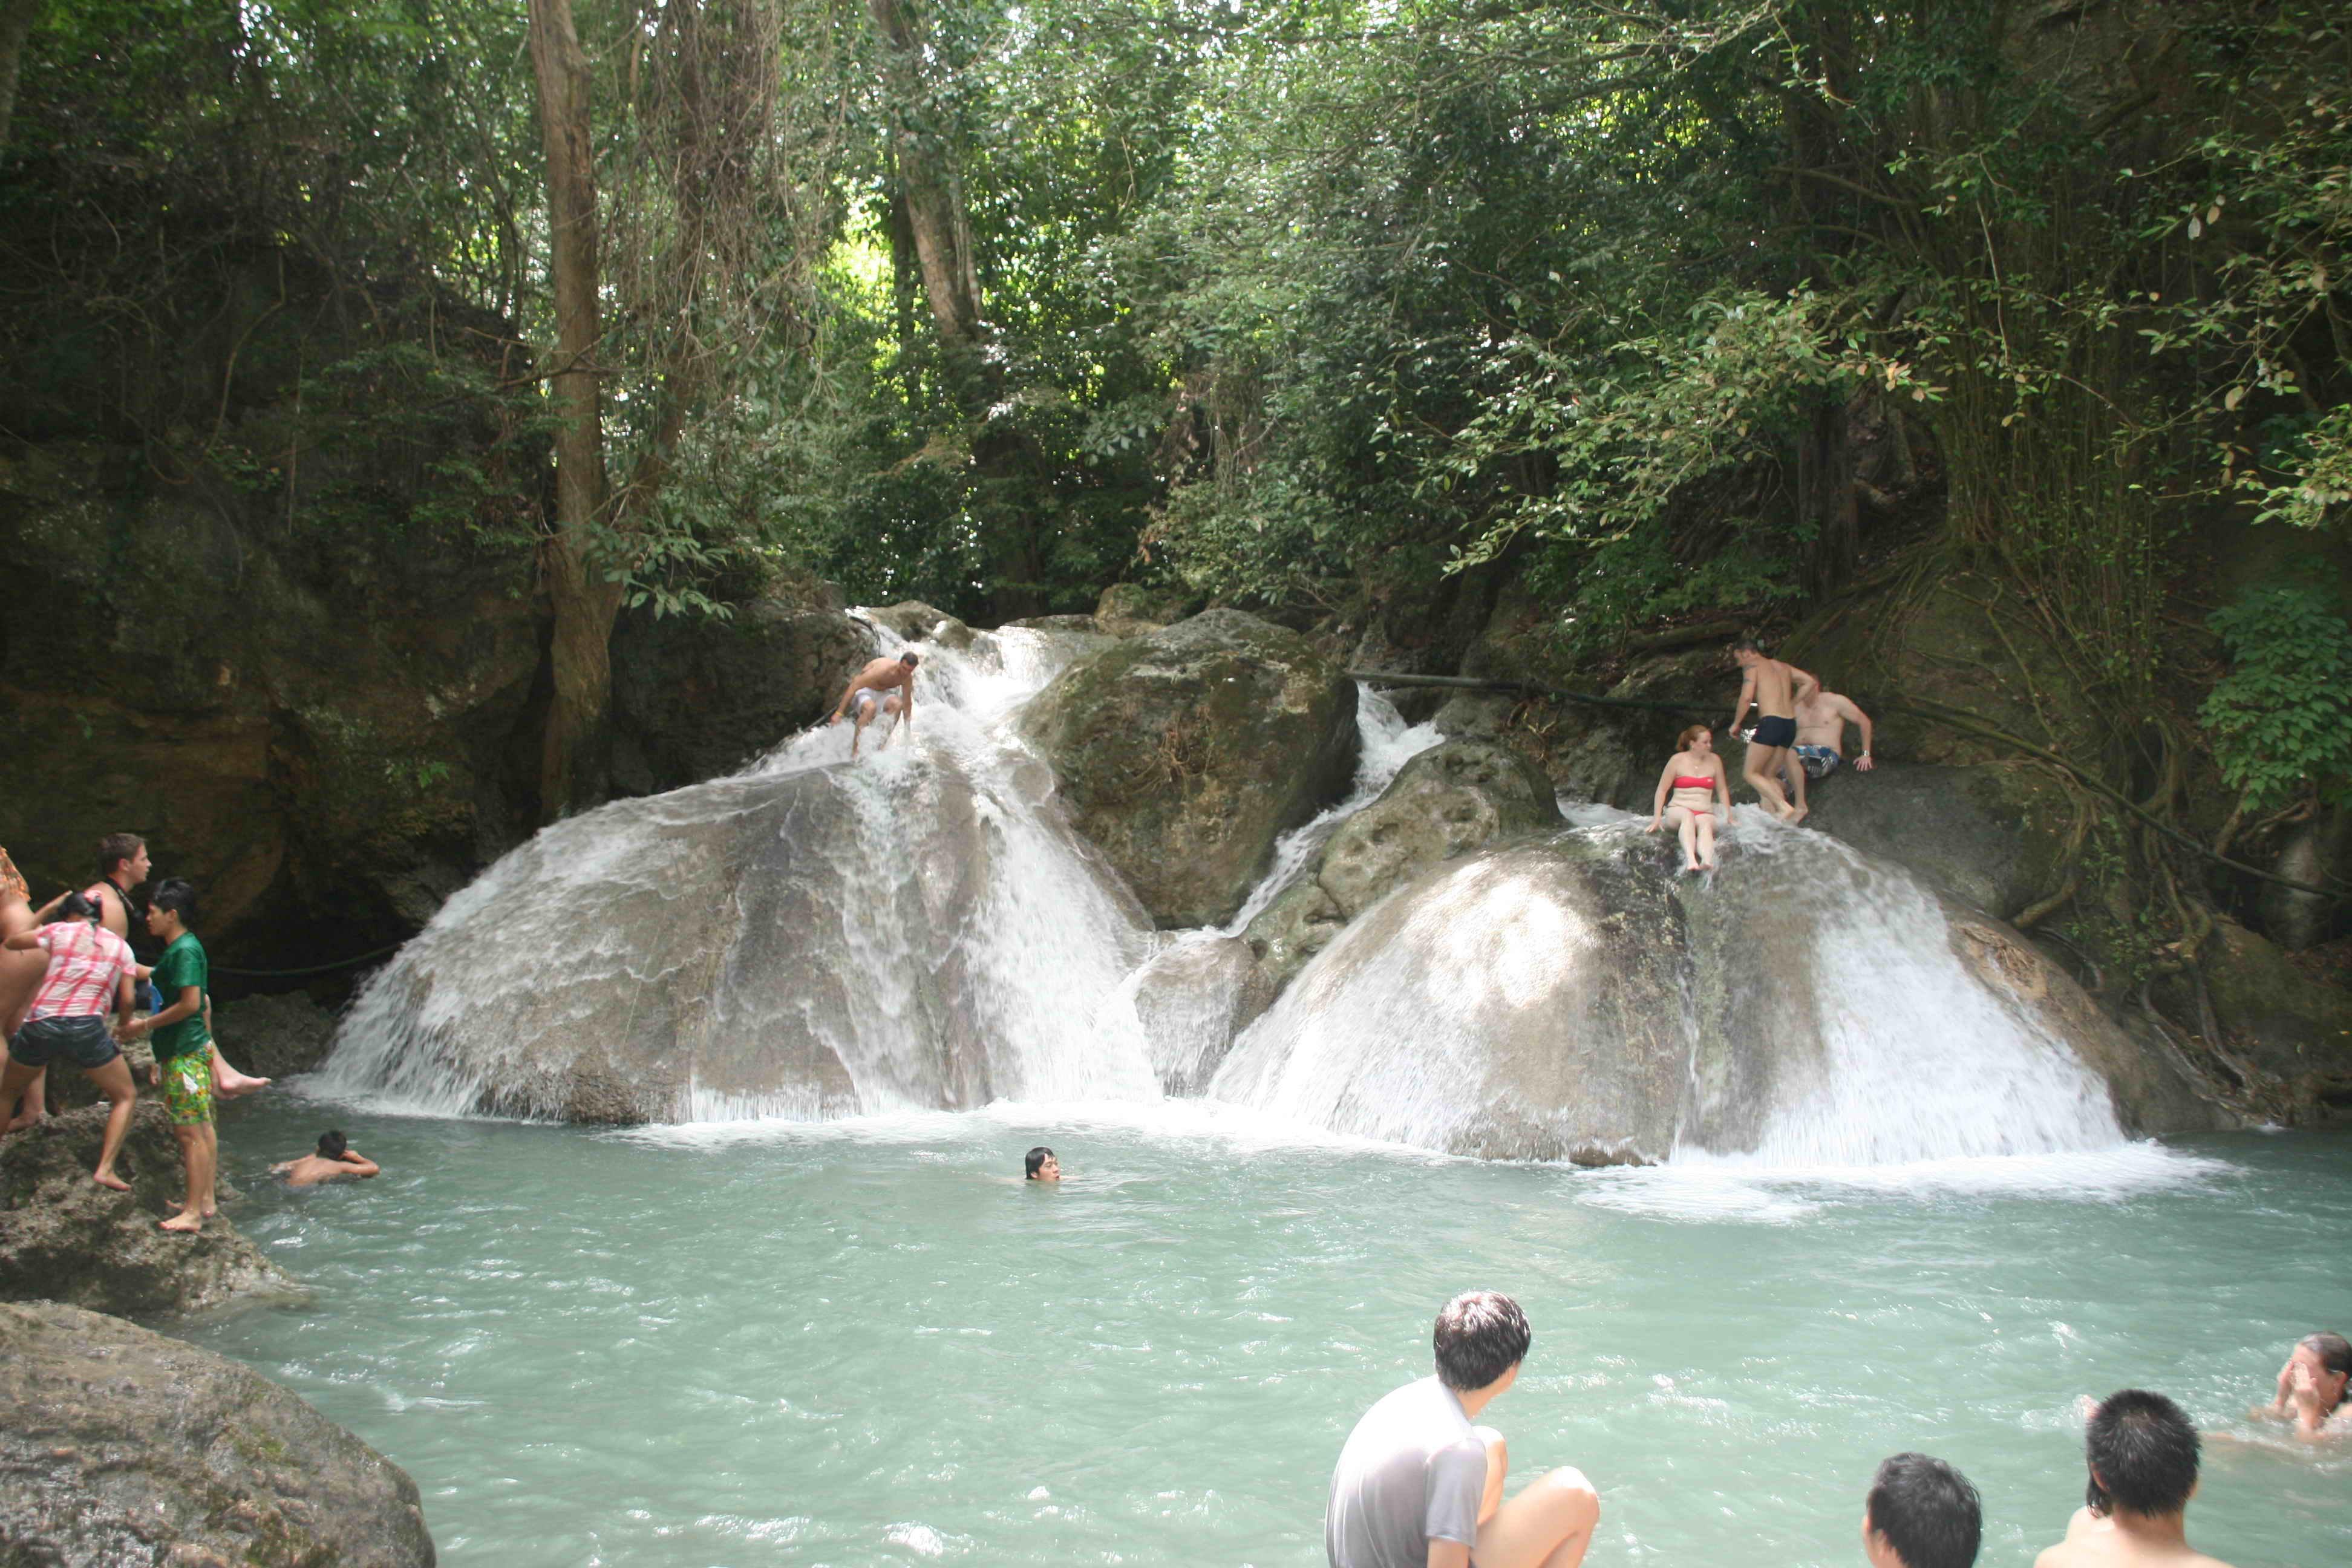 OUTLAST благодаря водопады таиланд к реке квай стирка, значительно